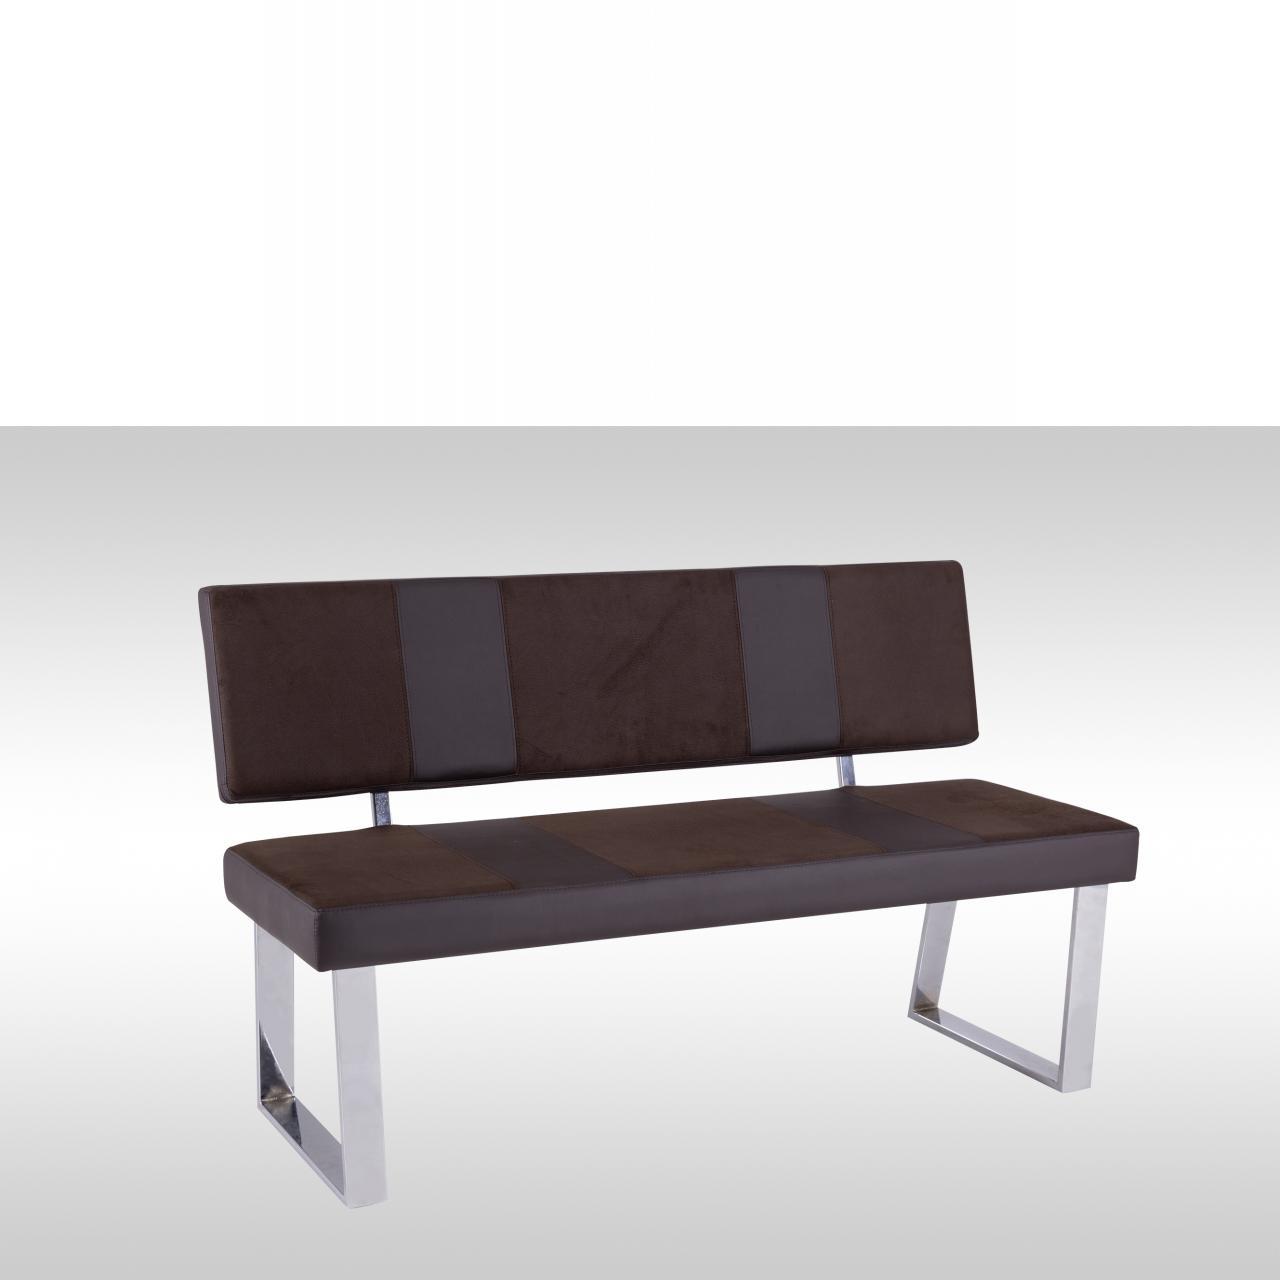 Sitzbank Santa Bari R5122-28